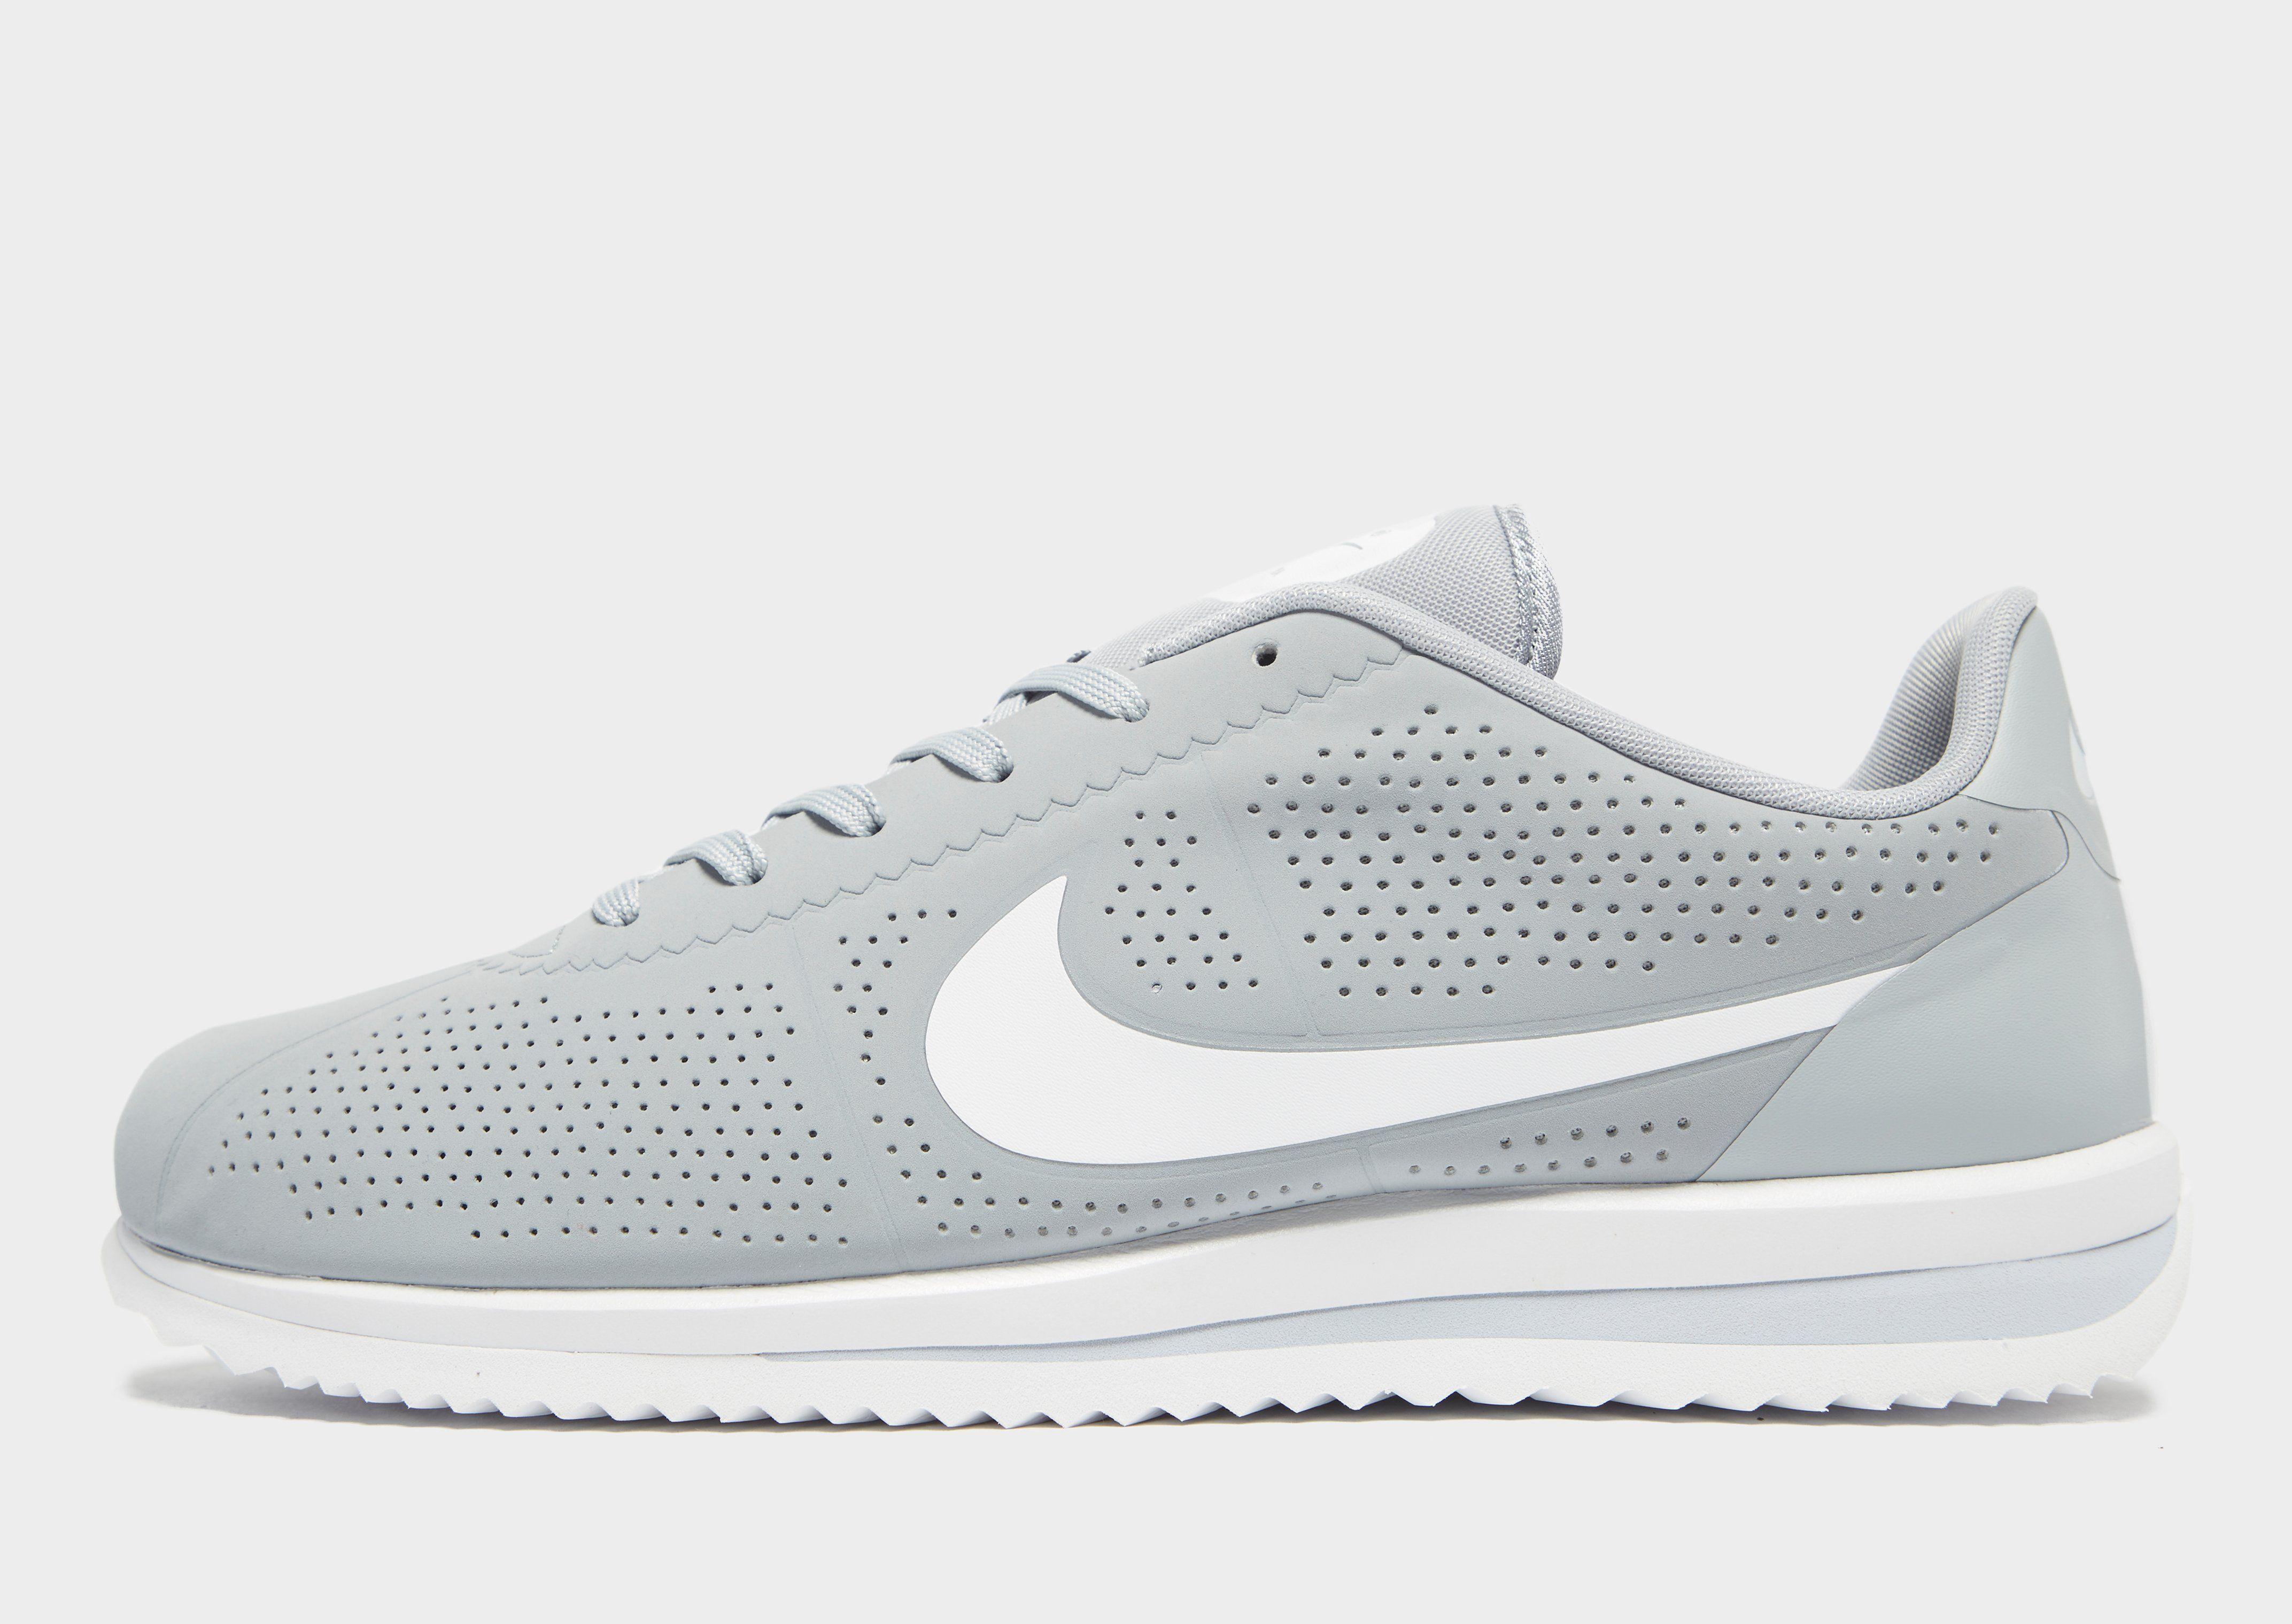 check out d32d9 8bb88 Nike Cortez Ultra Moire | JD Sports